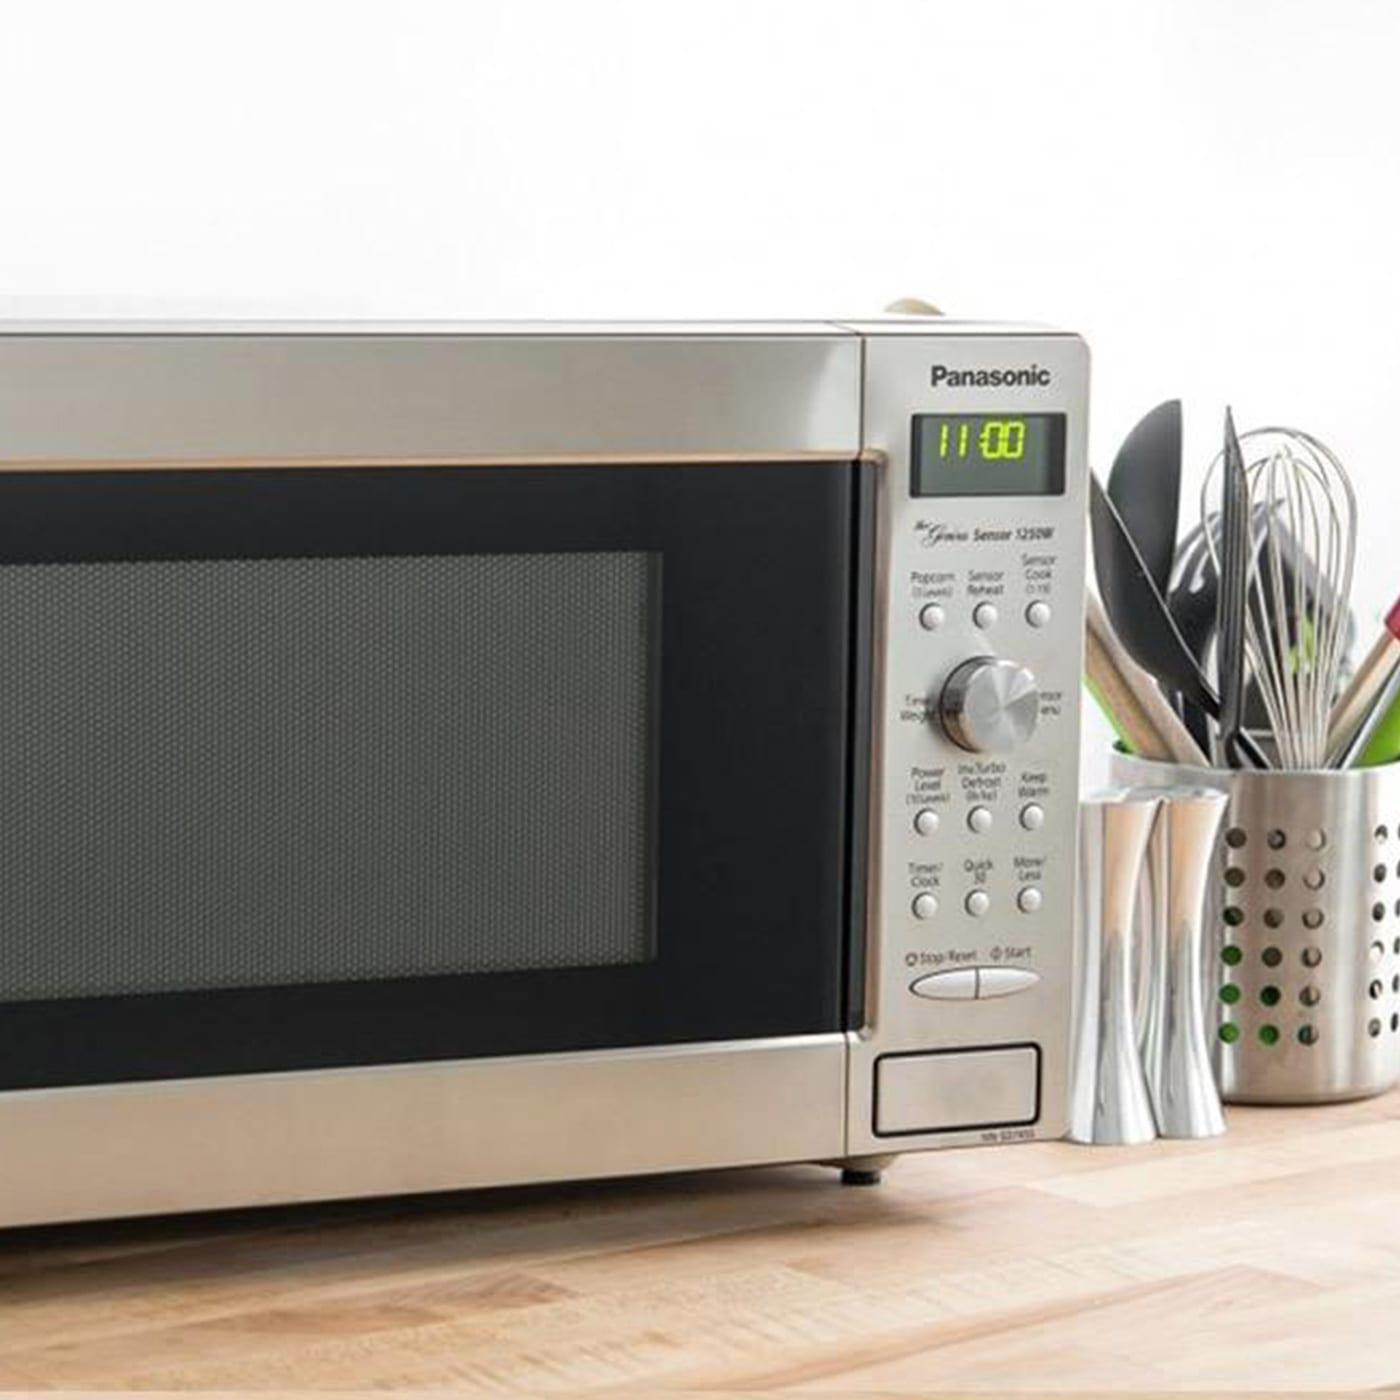 31st Panasonic Microwave instore POS tile